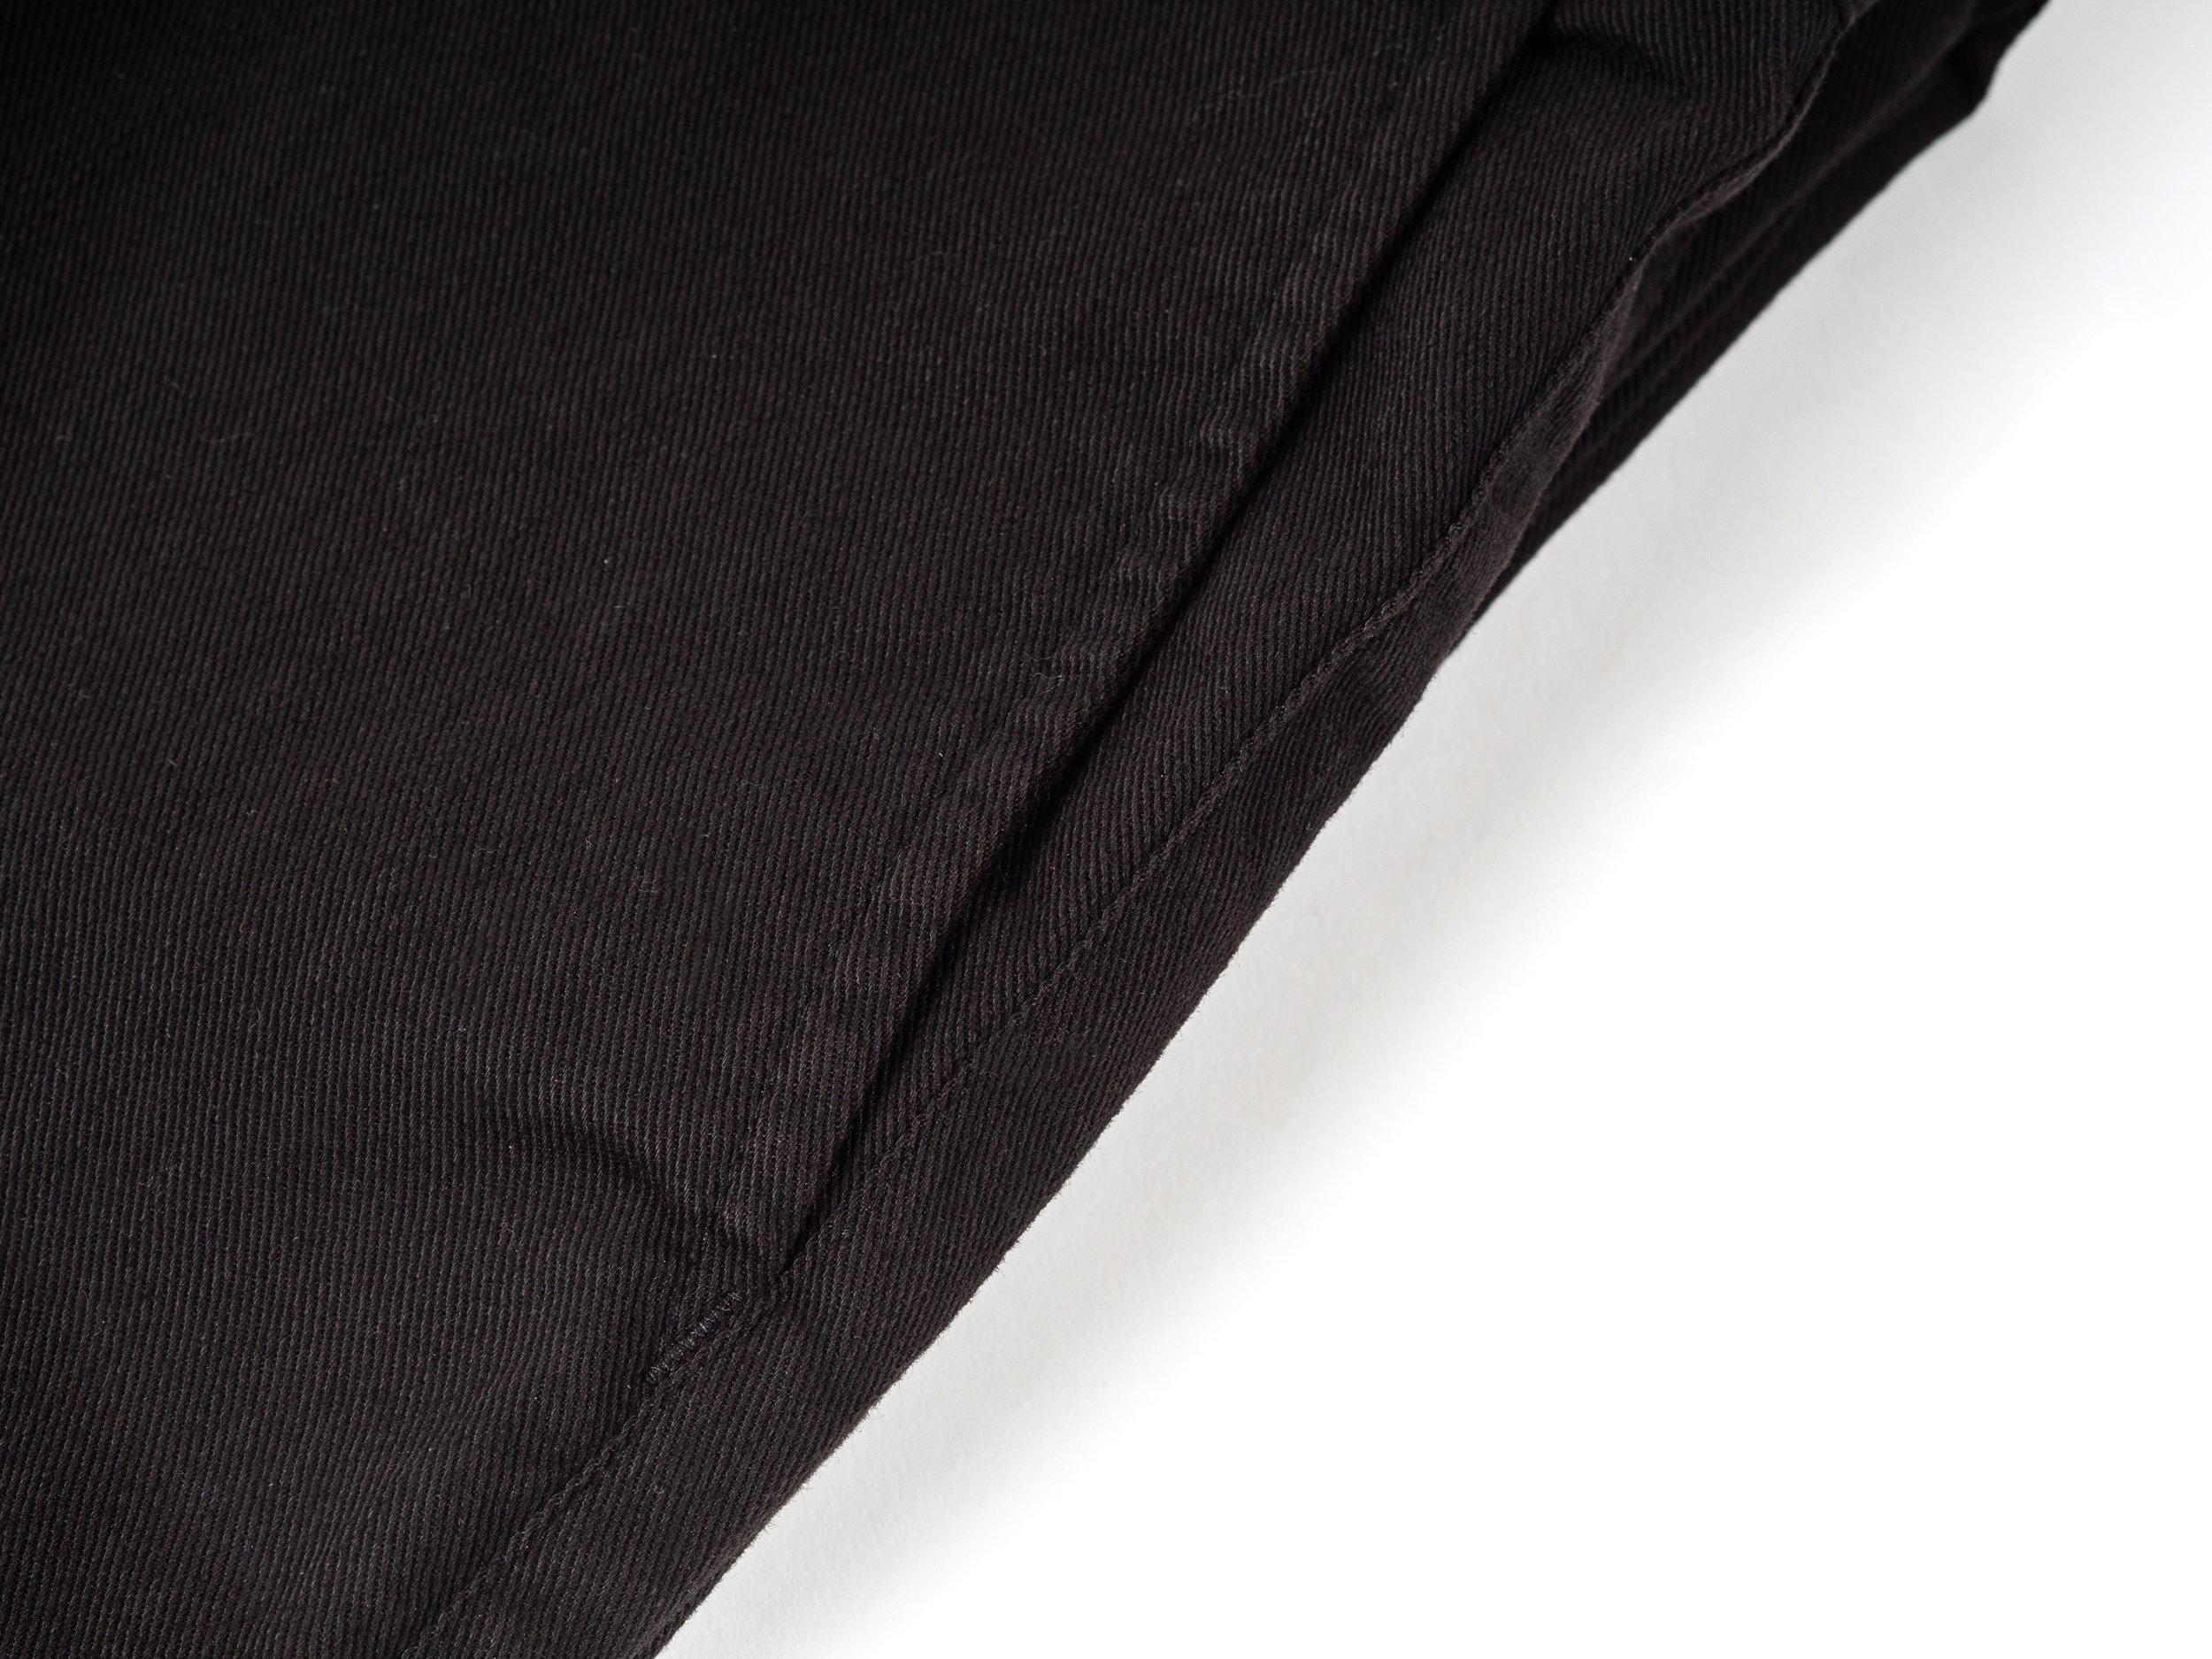 Outclass-Pants_-7.jpg